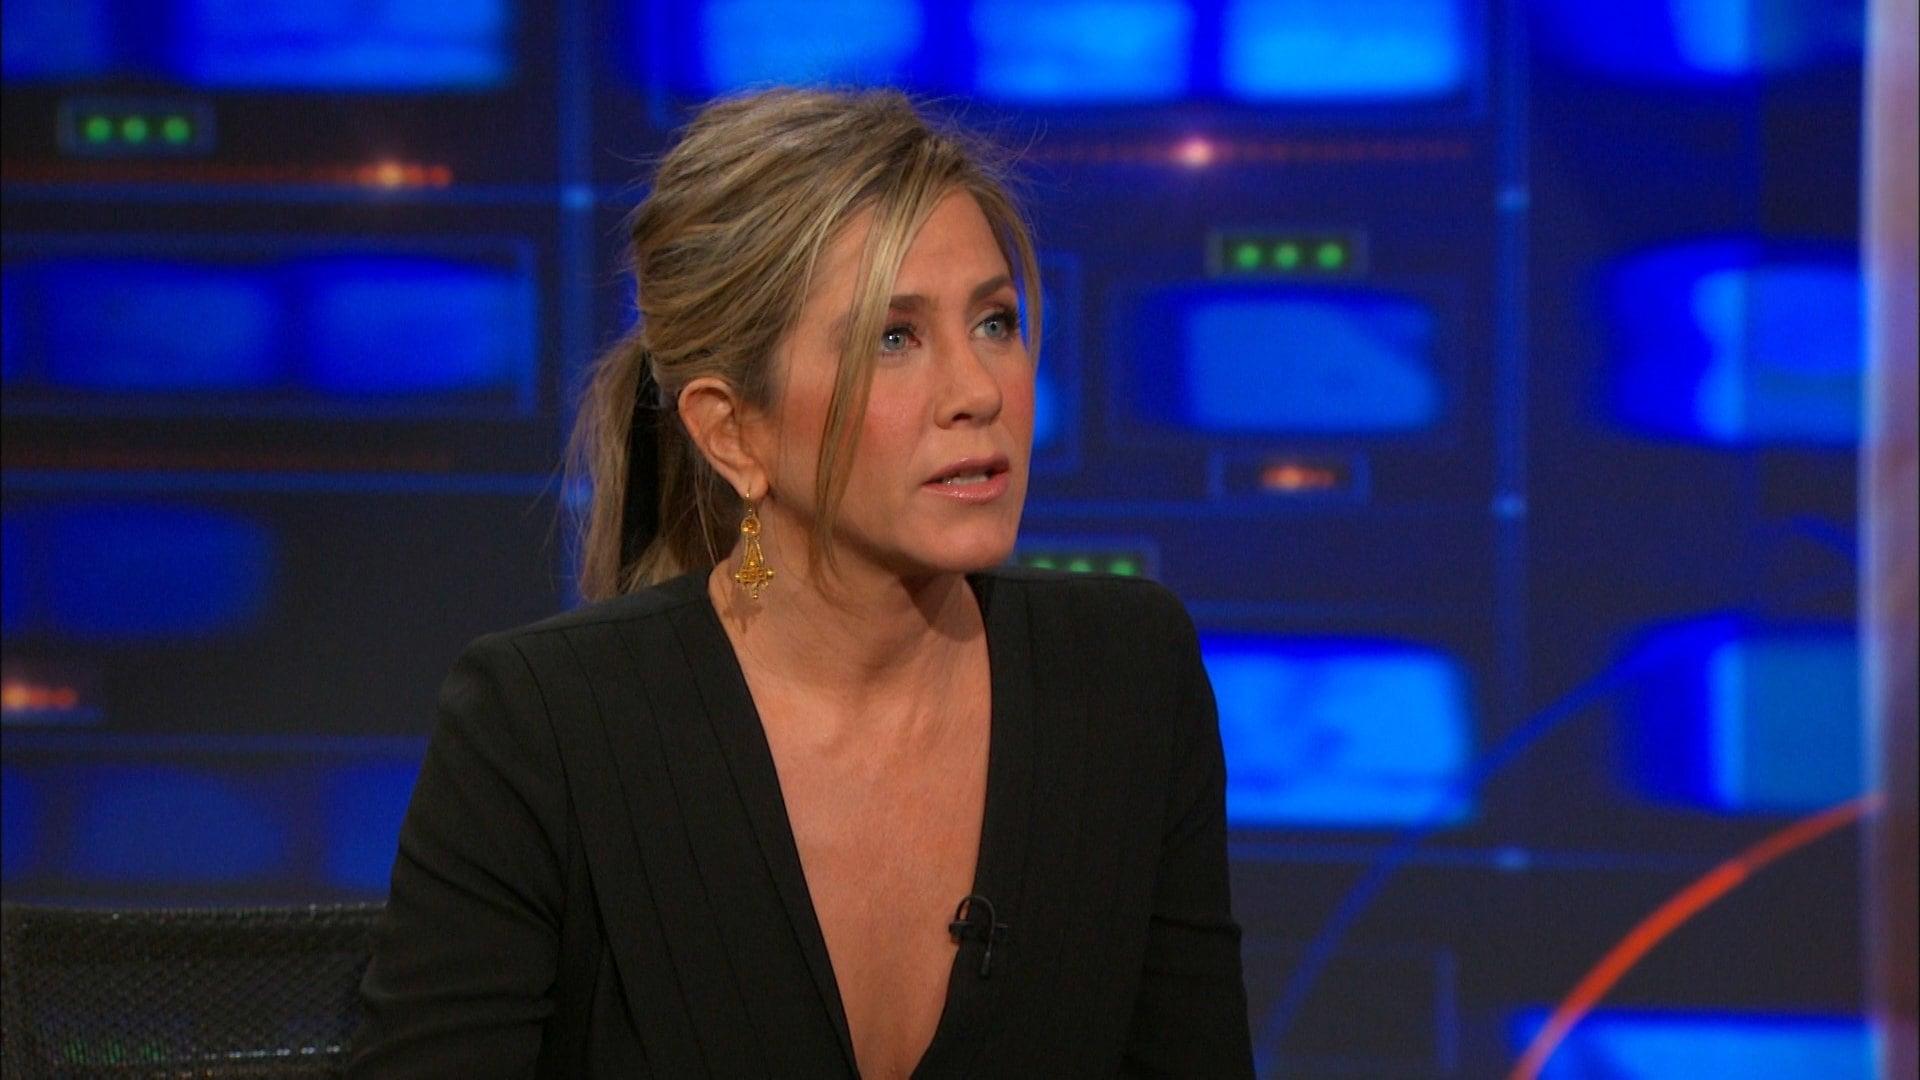 The Daily Show with Trevor Noah Season 20 :Episode 52  Jennifer Aniston